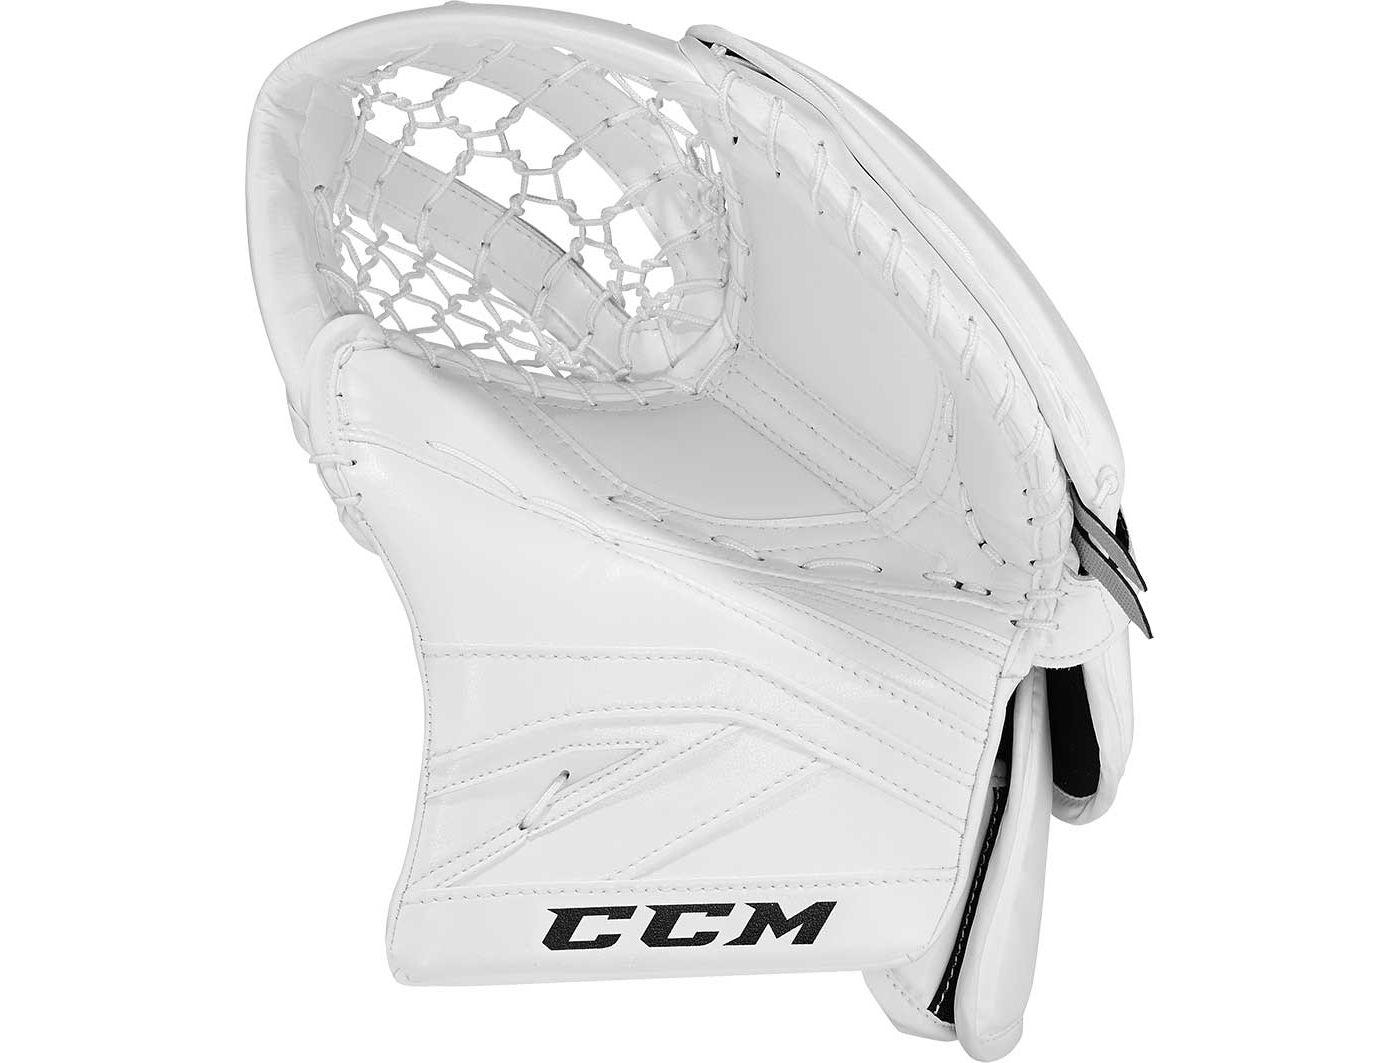 CCM Senior Premier P2.9 Ice Hockey Goalie Glove